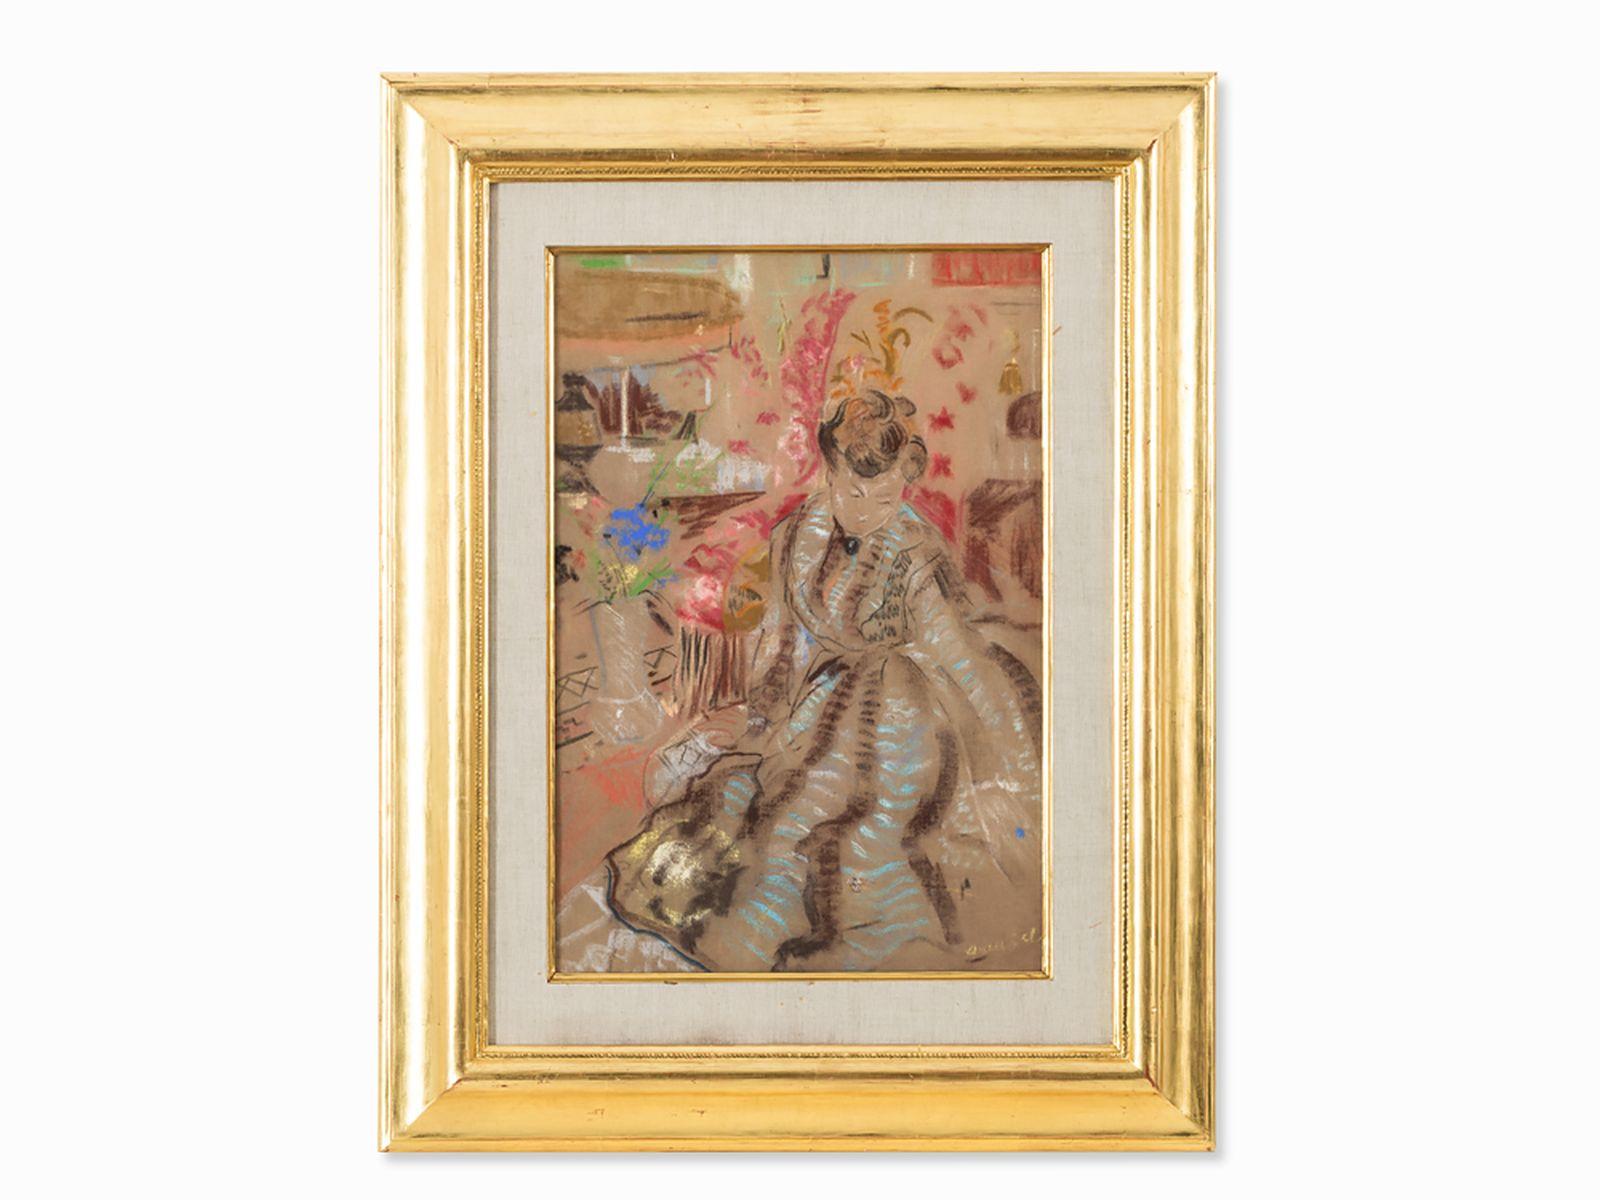 "#18  Emilio Grau Sala (1911-1975), Lady in a Salon, Pastel, 20th C. Emilio Grau Sala (1911-1975), ""Dame im Salon"" 20. Jh. Image"